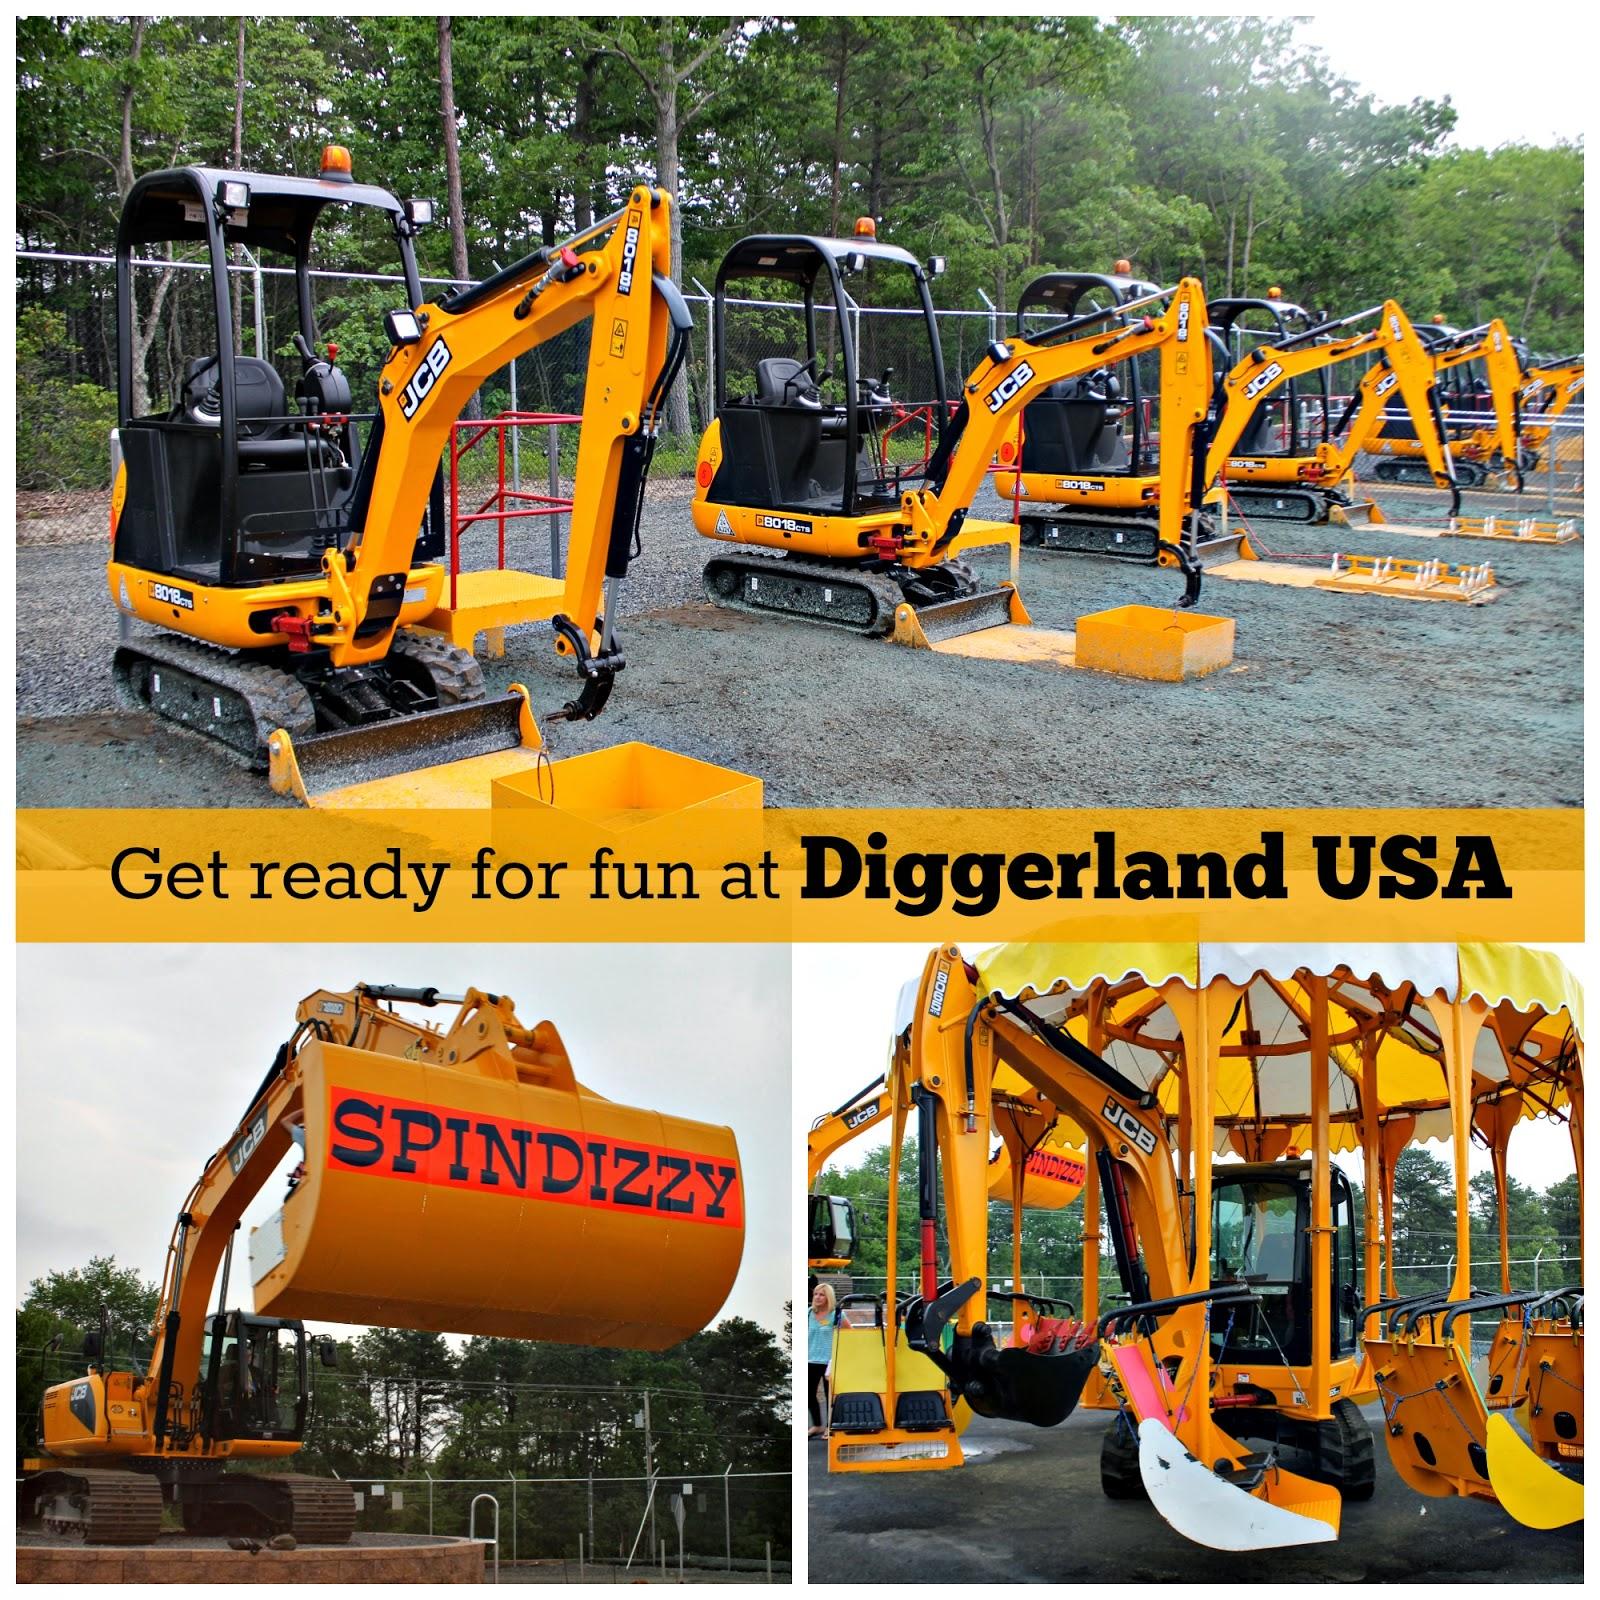 #DiggerlandUSA, #Diggerland